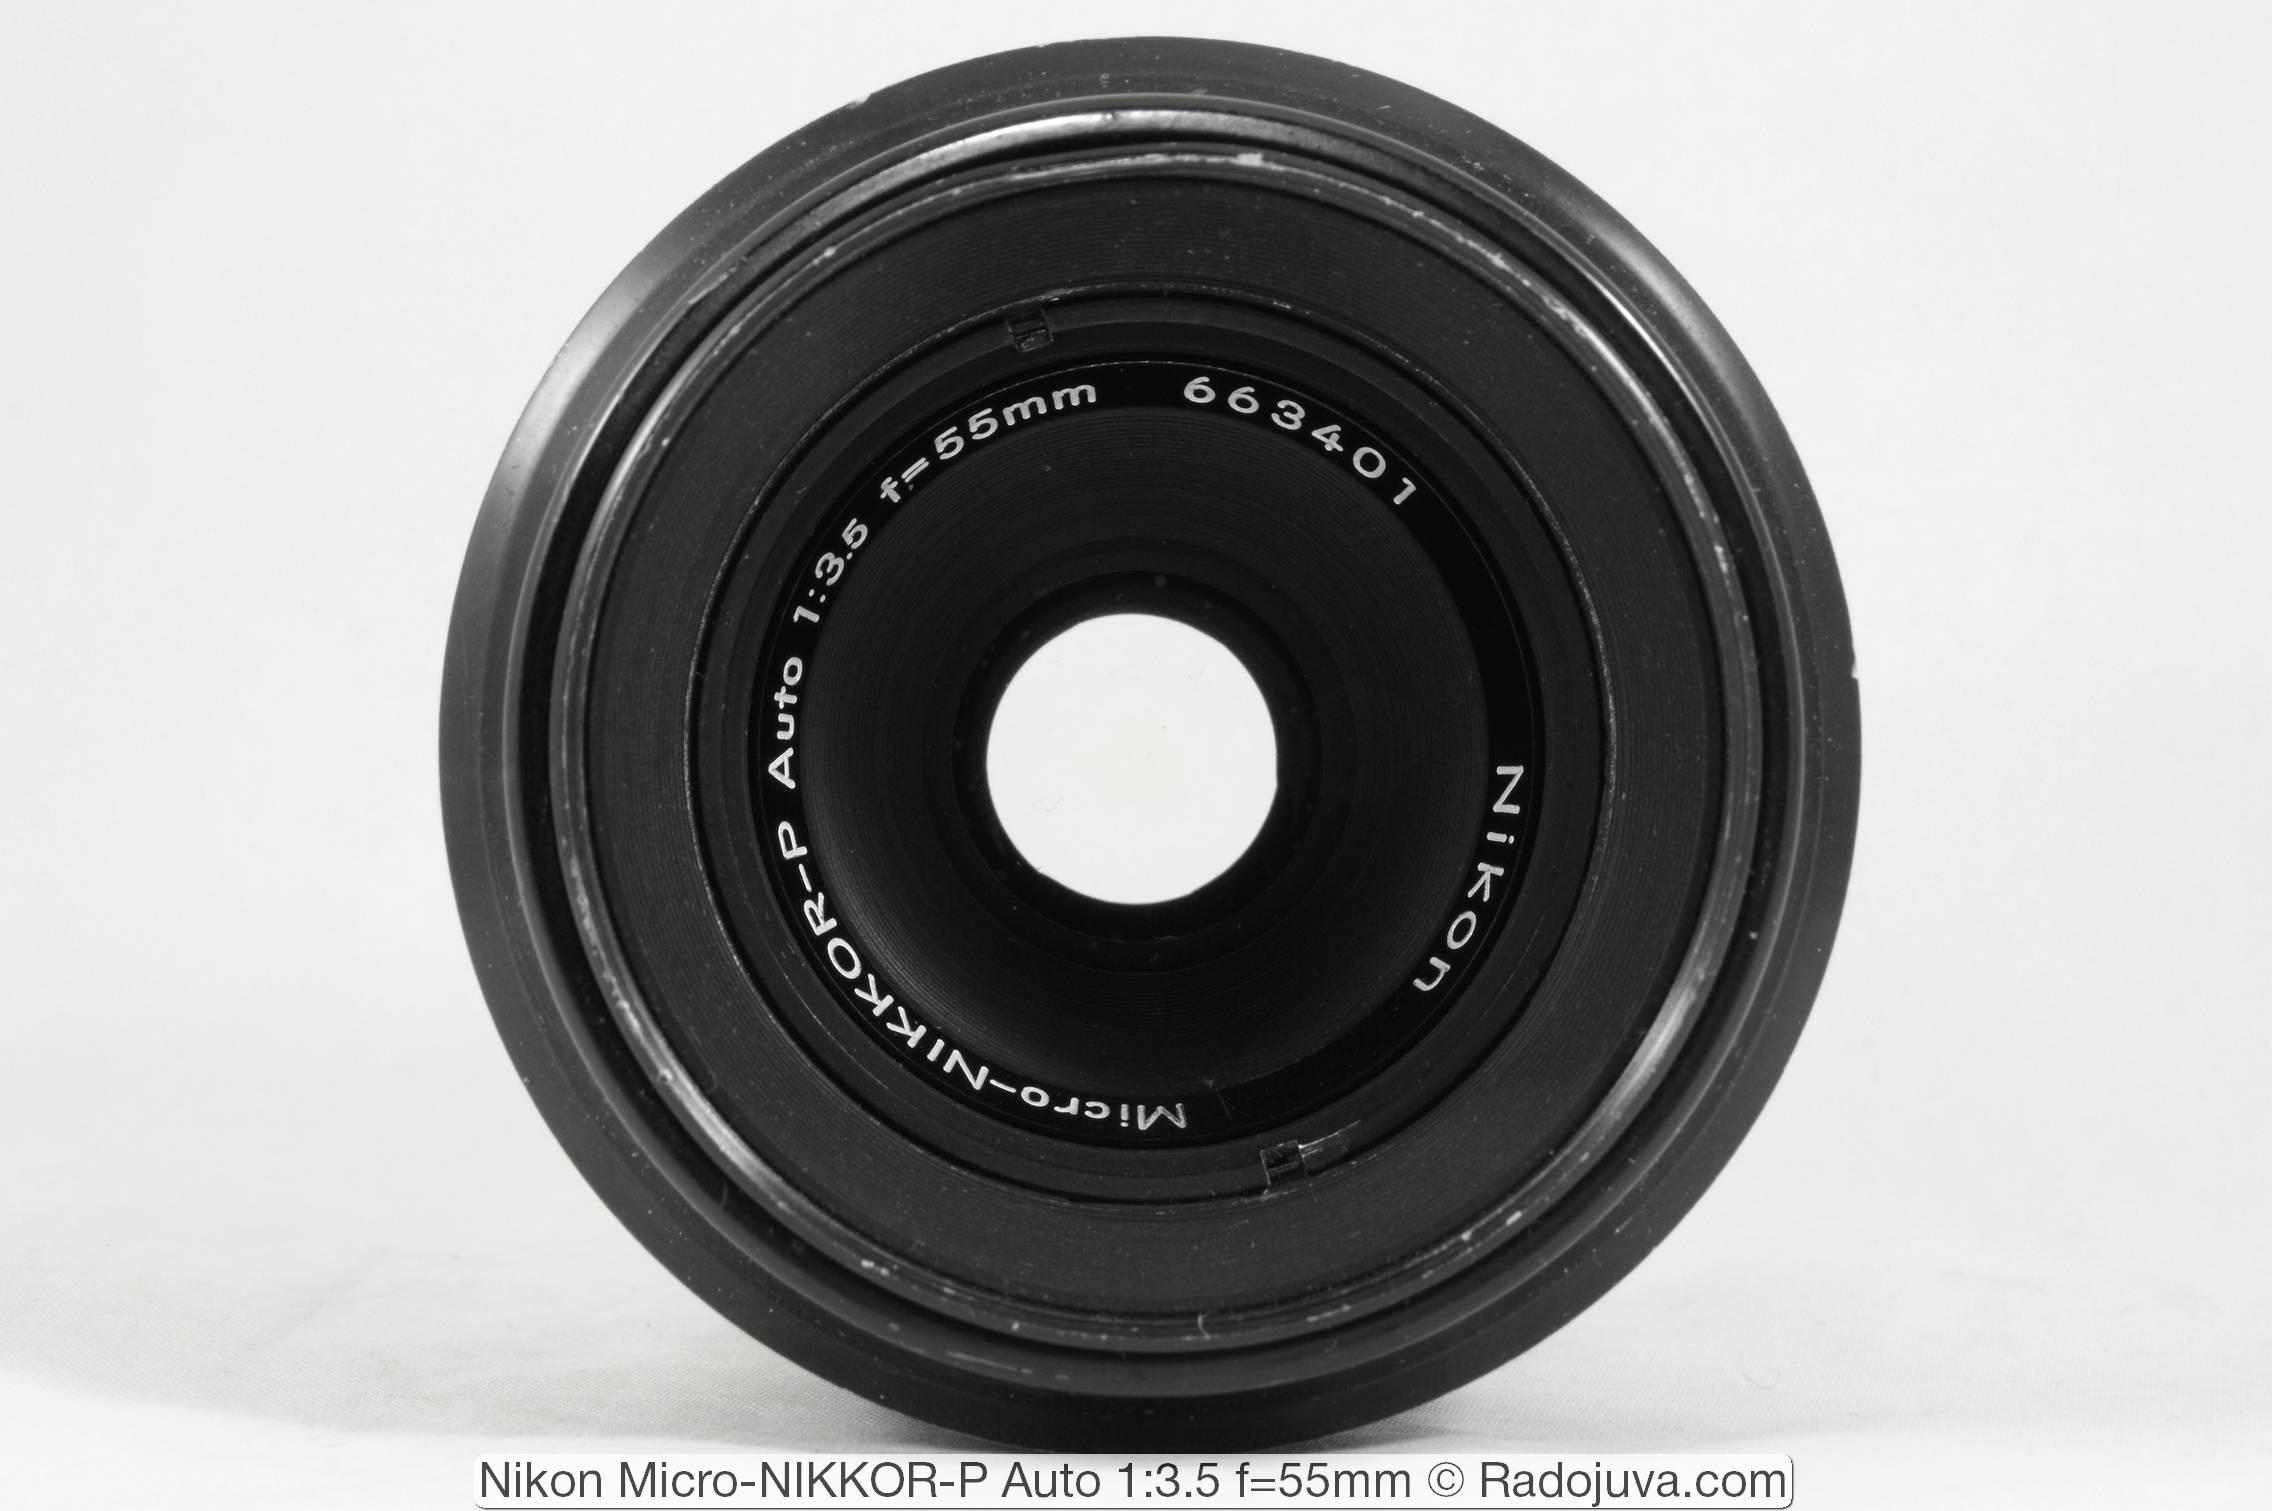 Nikon Micro-NIKKOR-P Auto 1: 3.5 f = 55mm